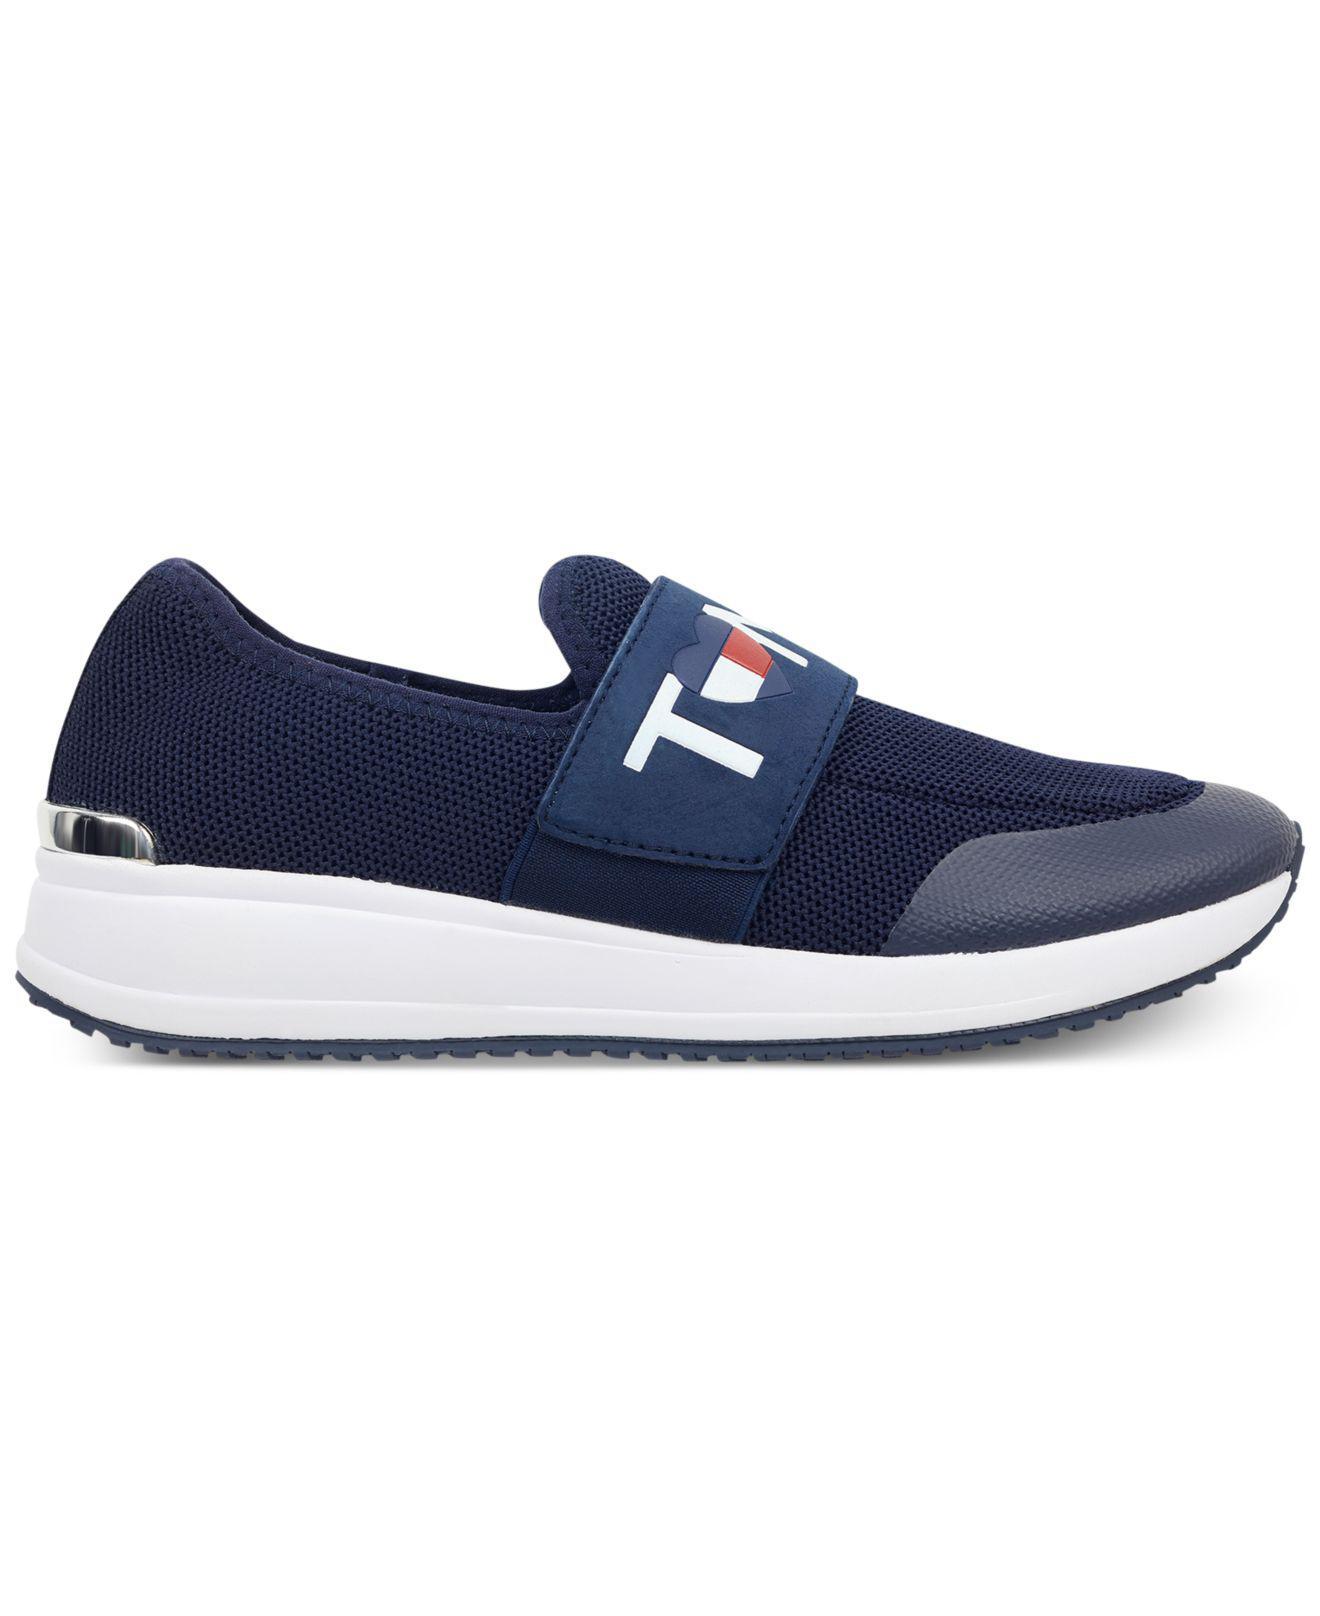 Tommy Hilfiger Rosin Slip-on Fashion